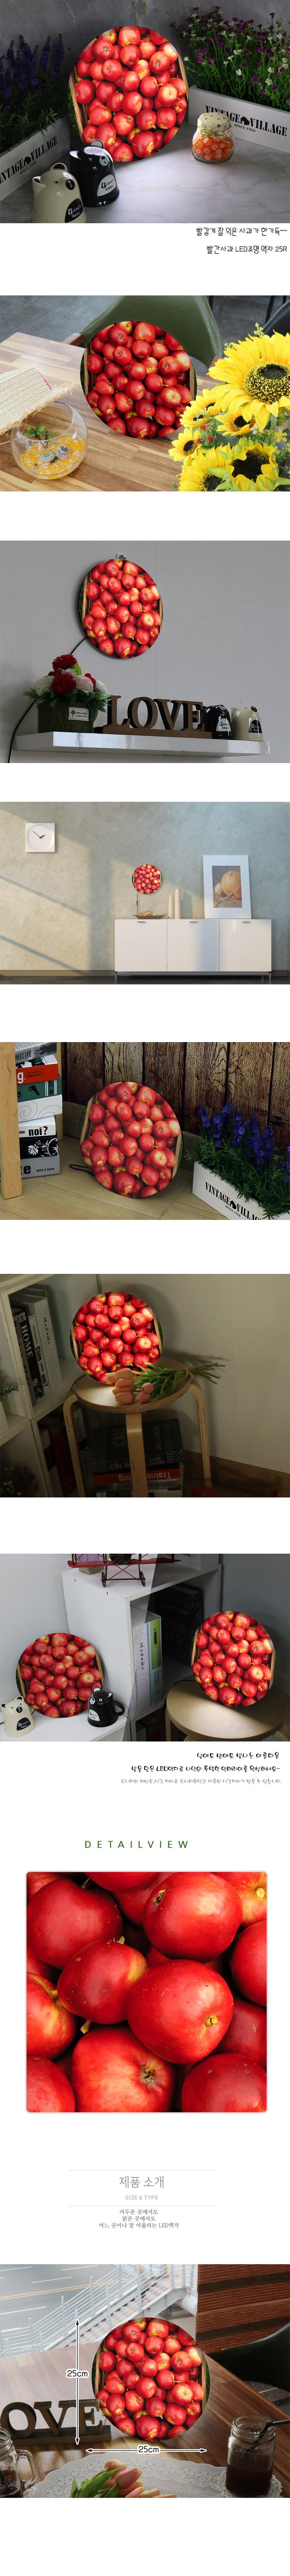 LED액자25R_빨간사과 - 꾸밈, 48,000원, 포인트조명, 터치조명